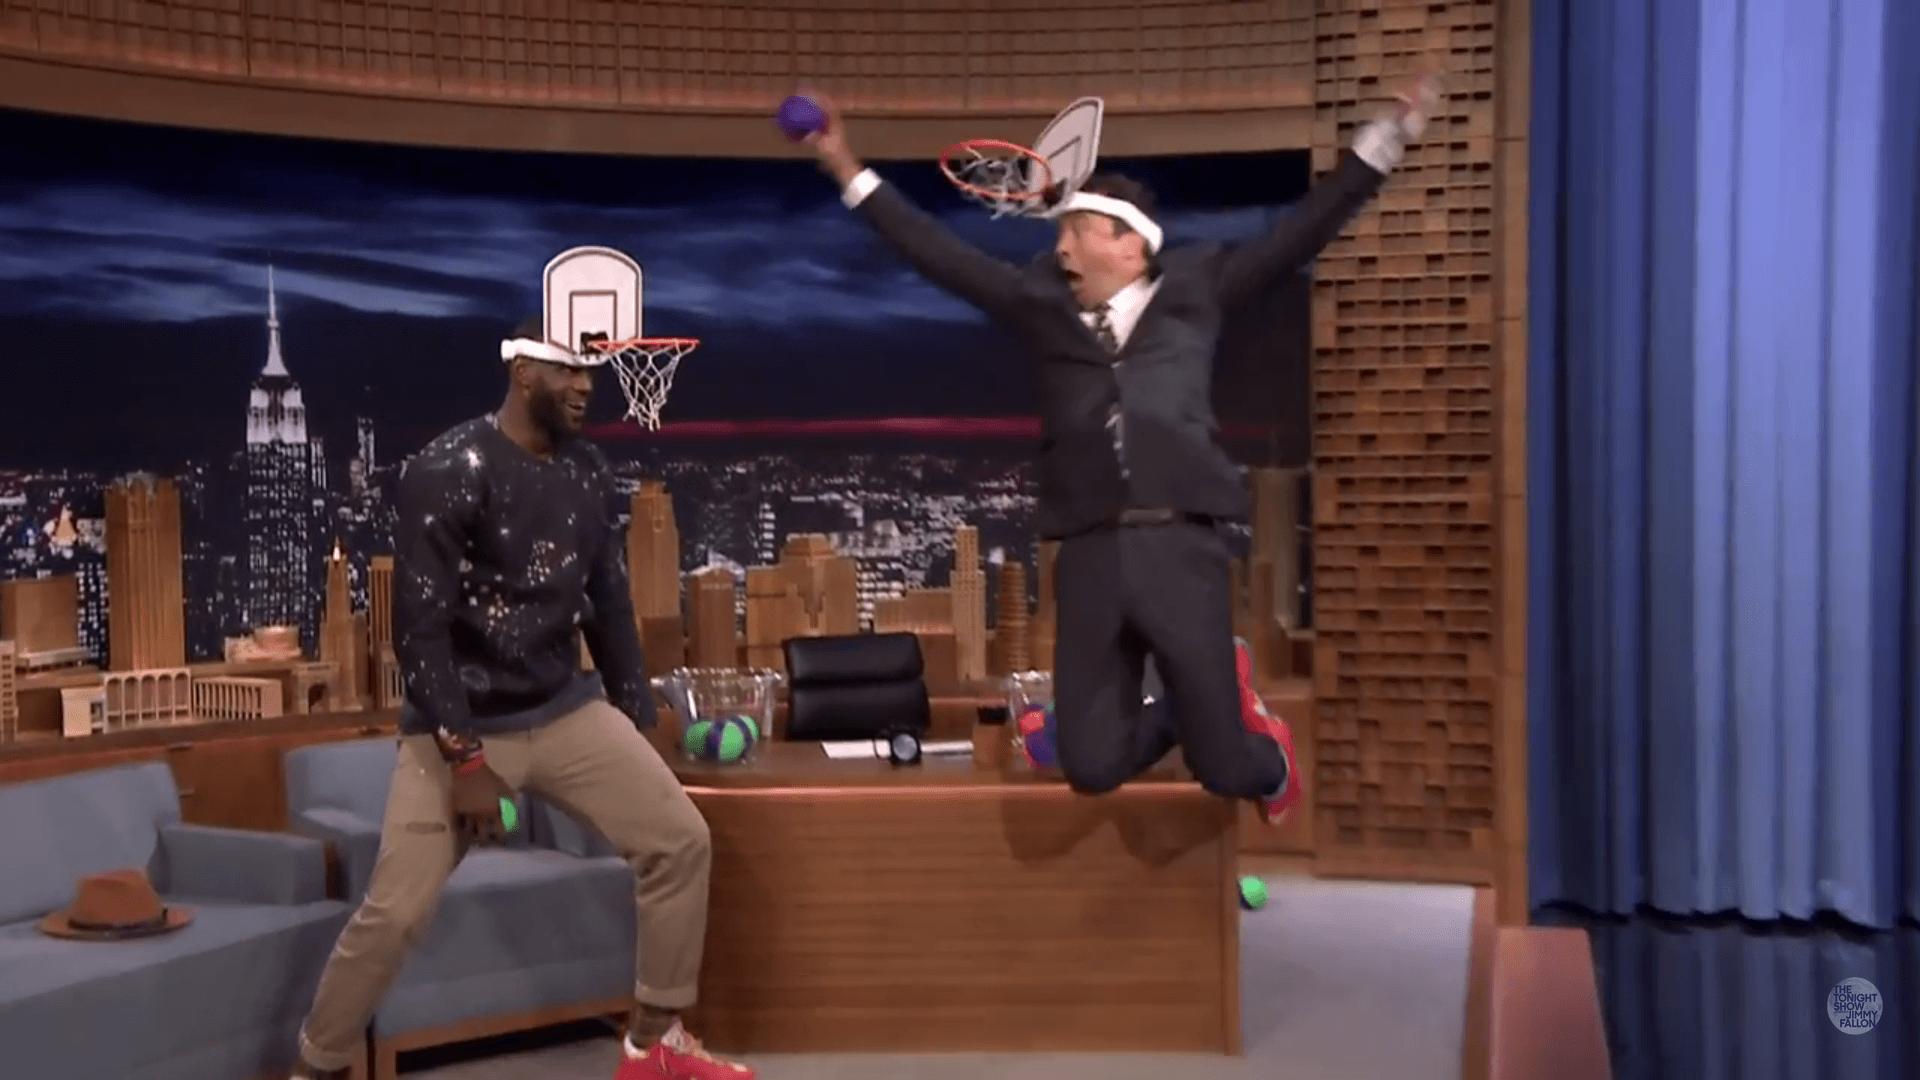 VIDEO: LeBron James, Jimmy Fallon Play Faceketball On The ...